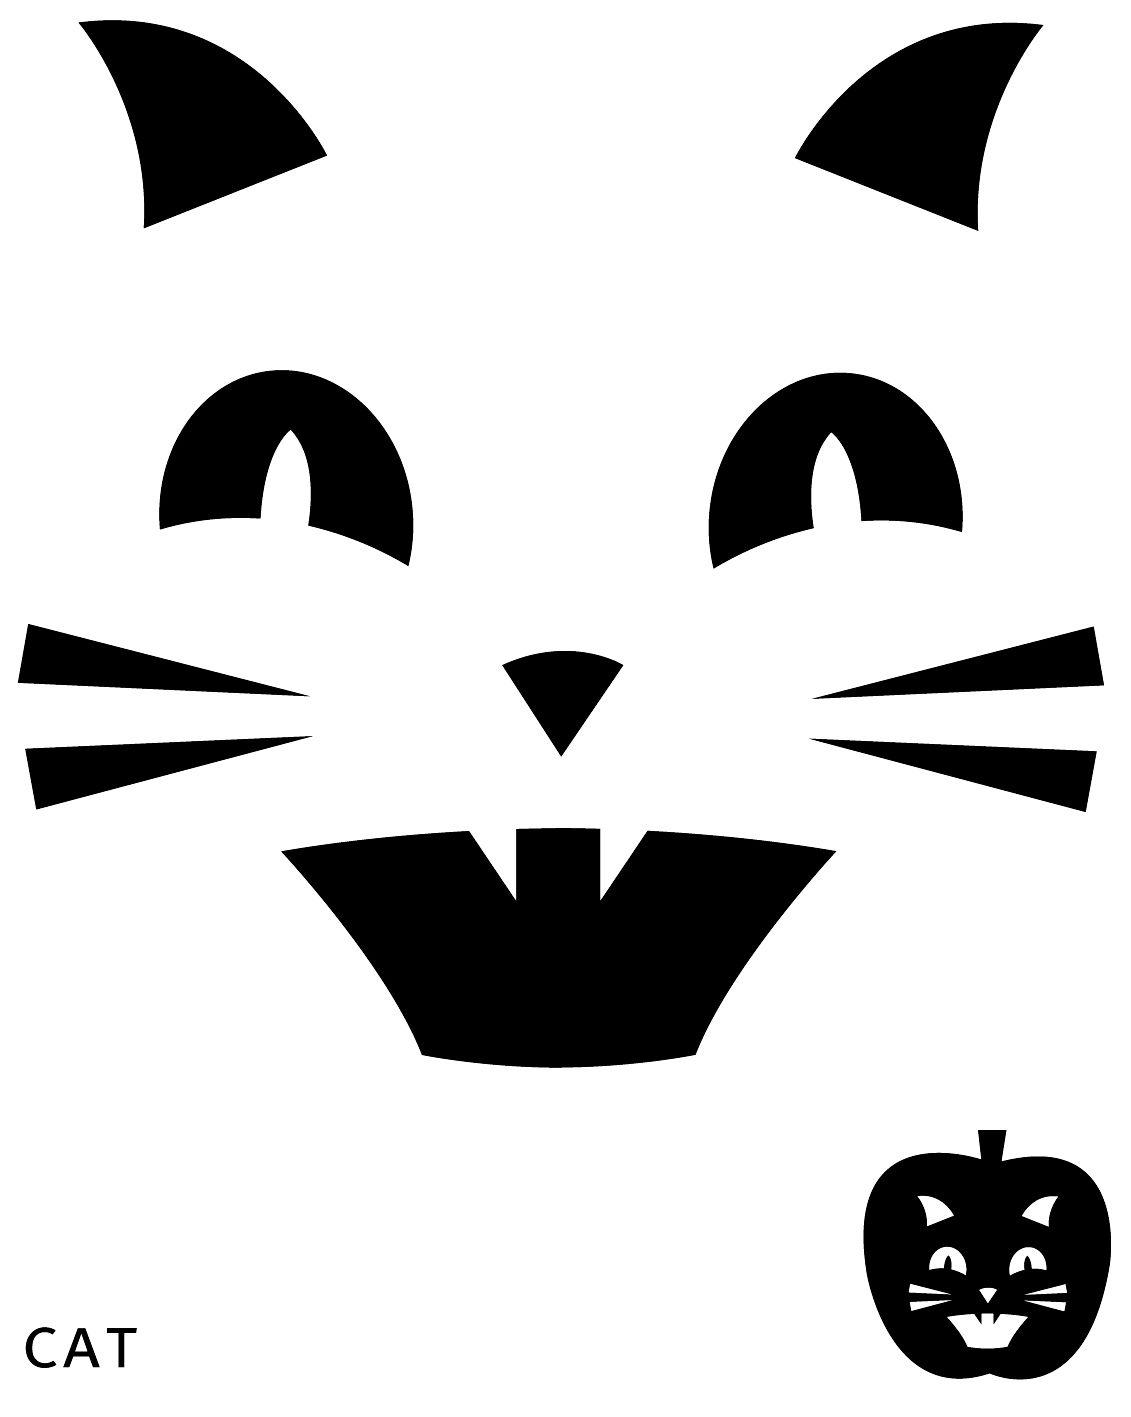 Top Cat Face Pumpkin Carving Pattern Stencil Template